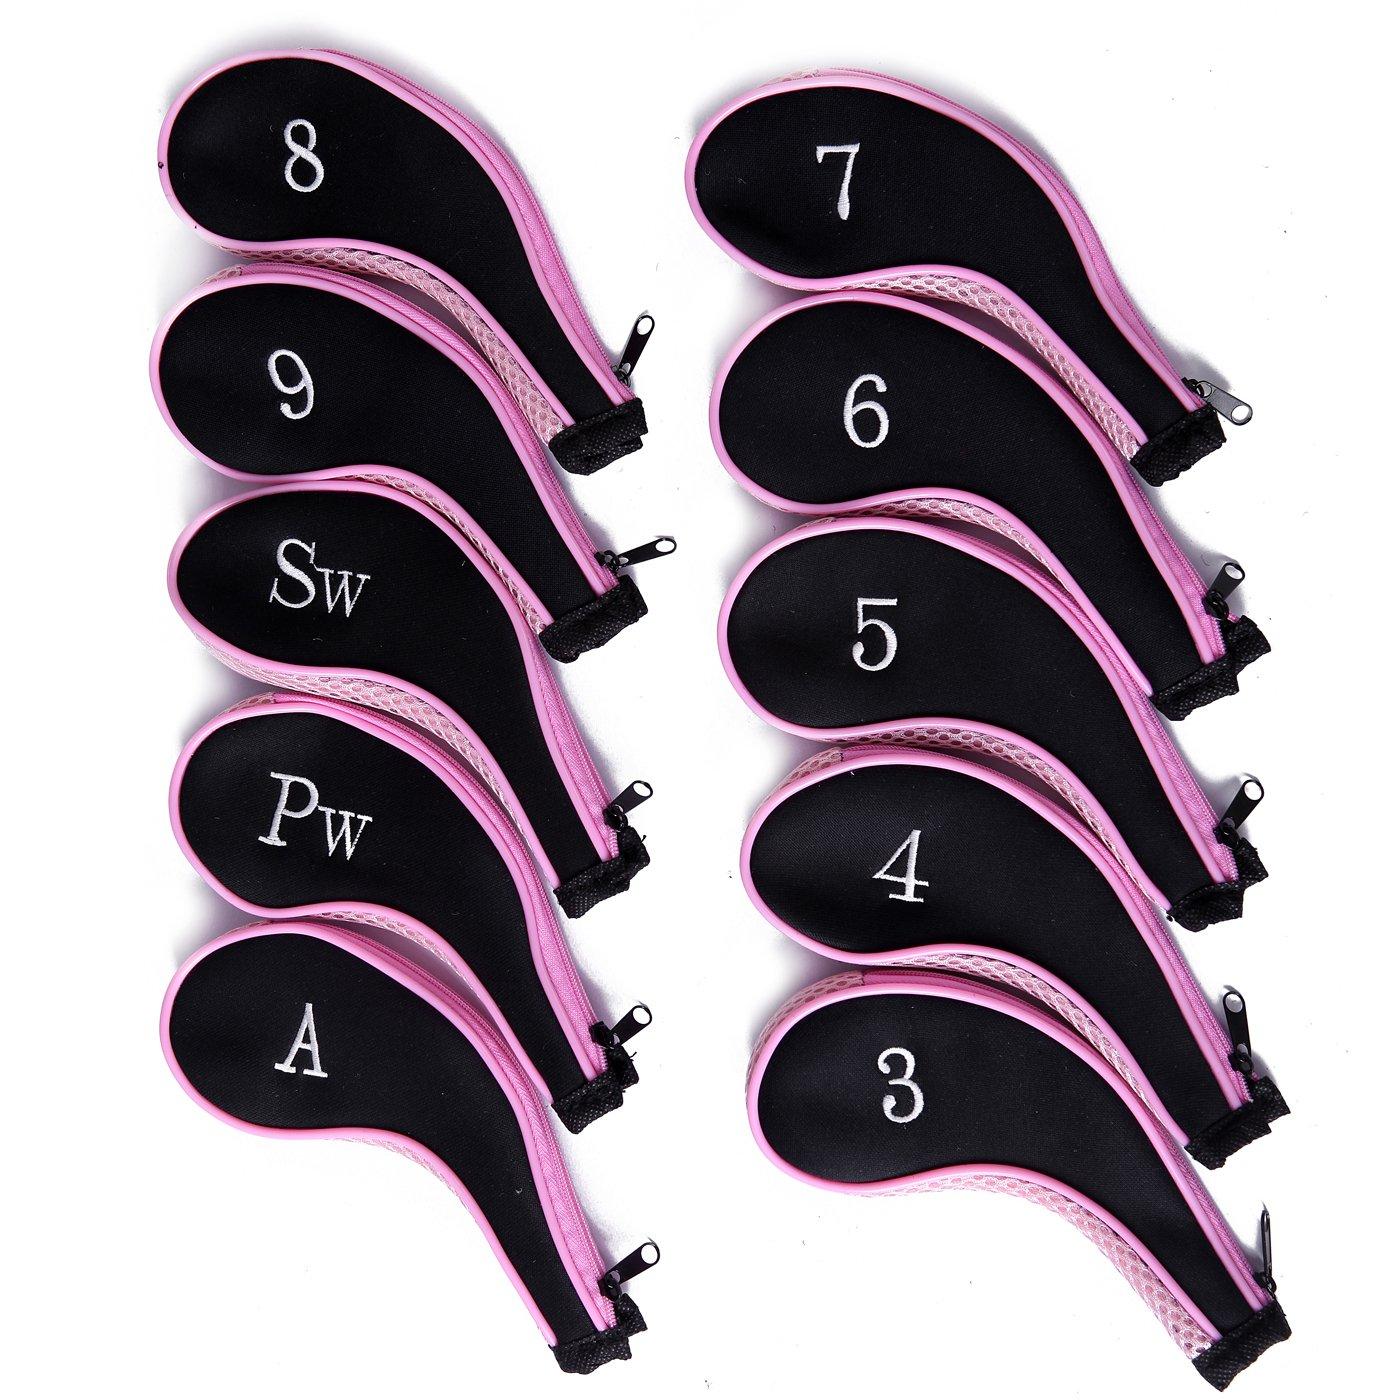 HDE Neoprene Zippered Golf Club Iron Covers - Set of 10 (Pink)